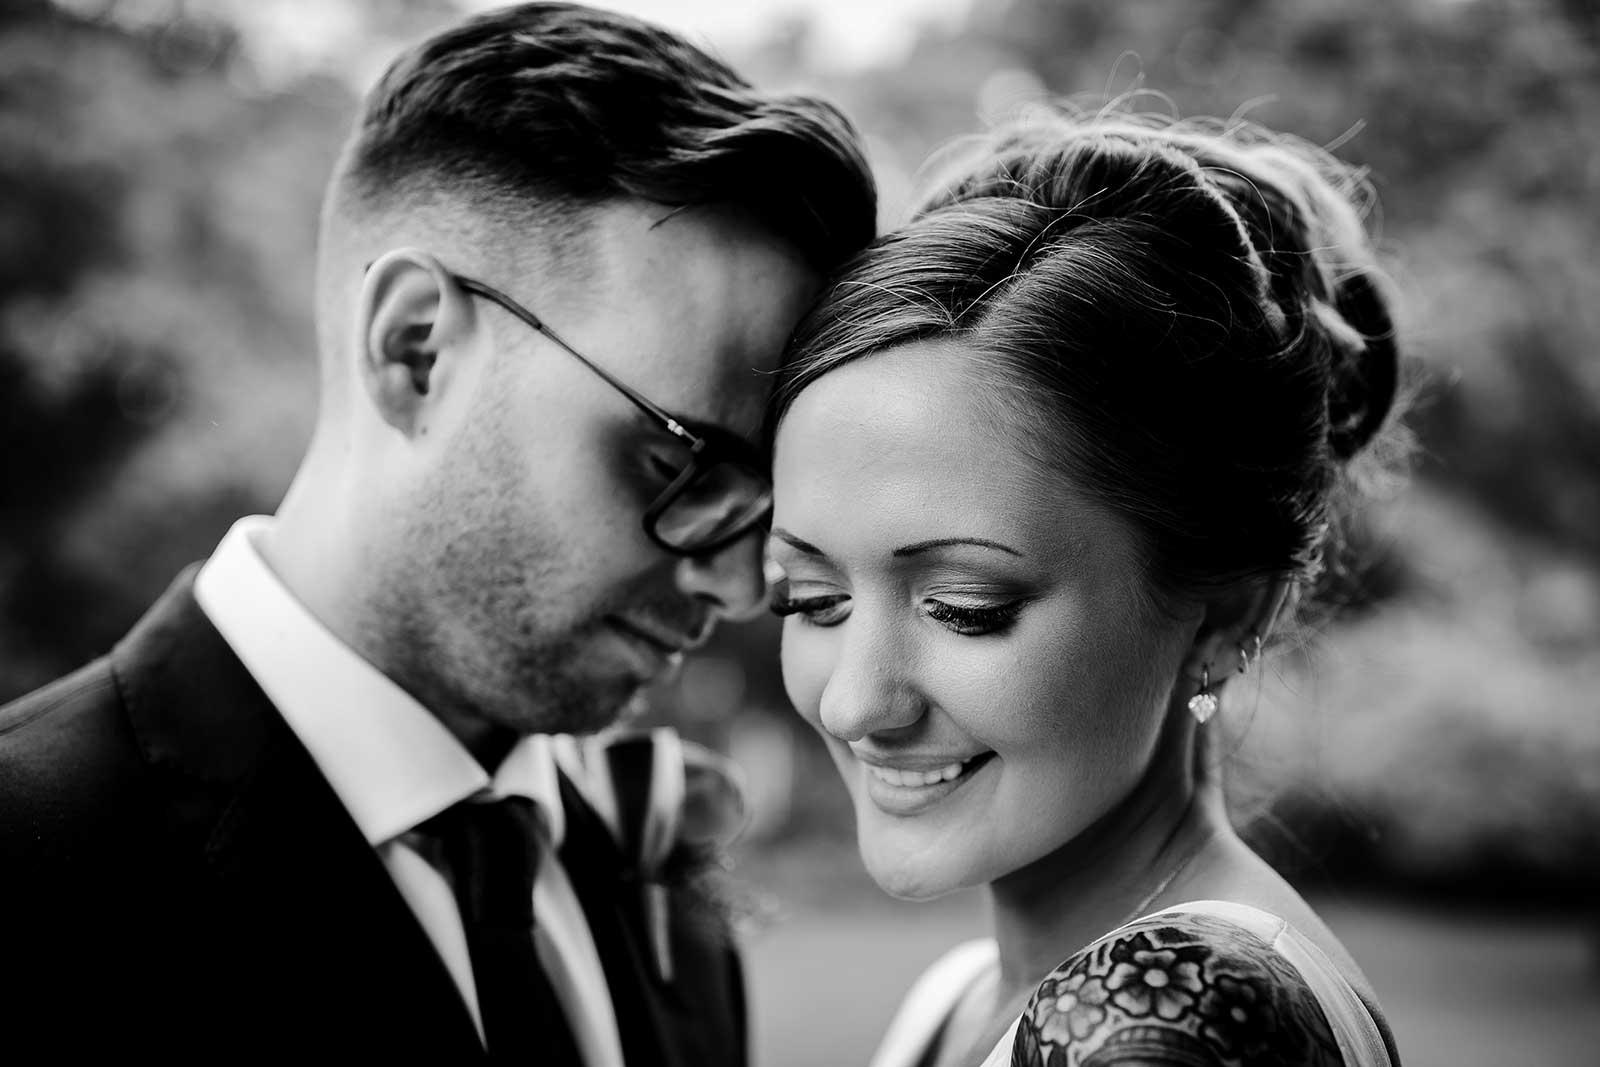 Intimate wedding photography Cardiff